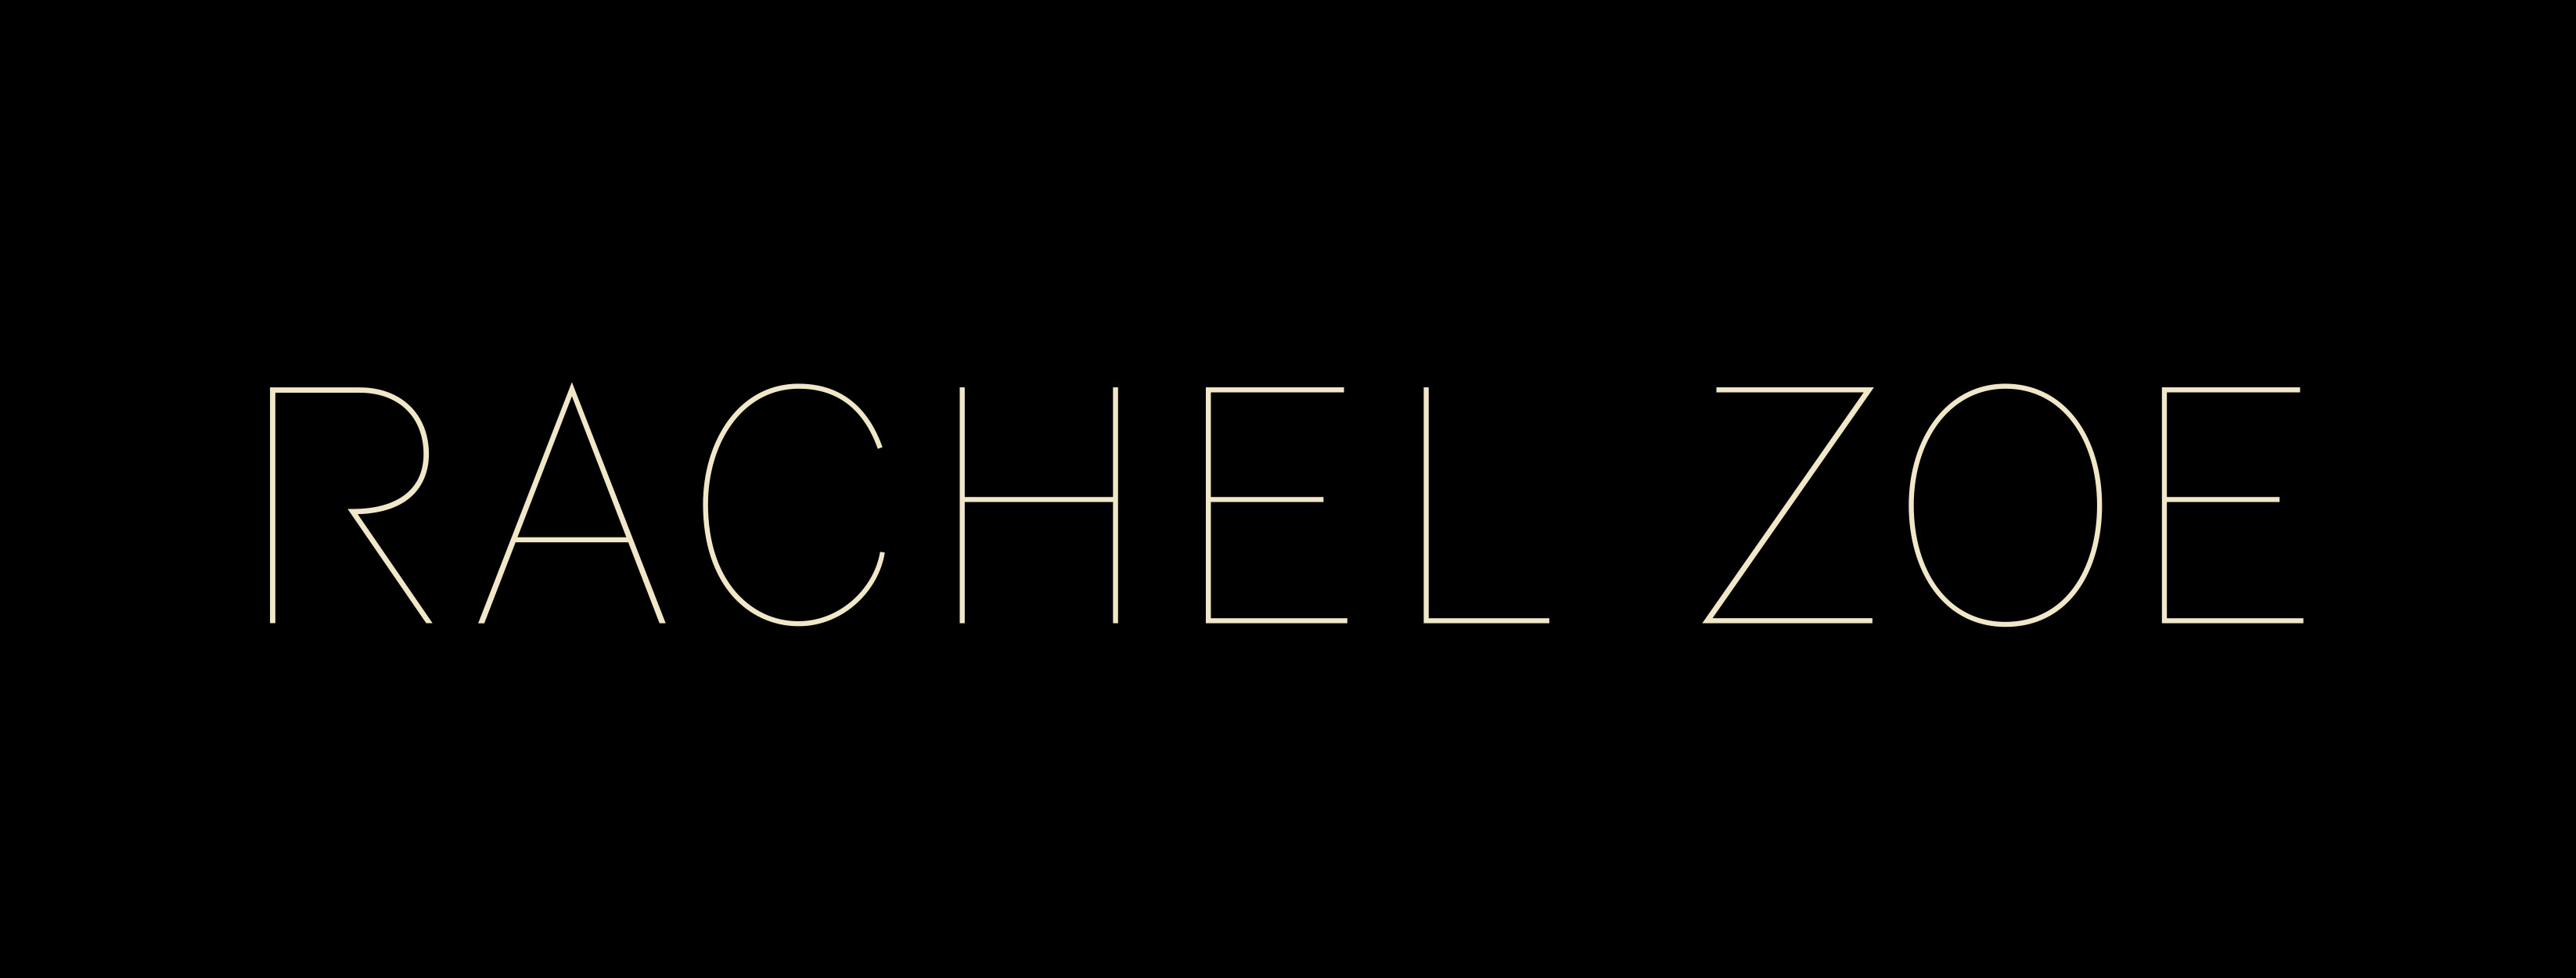 Rachel Zoe Logo - Black - Catherine Runyon.jpg